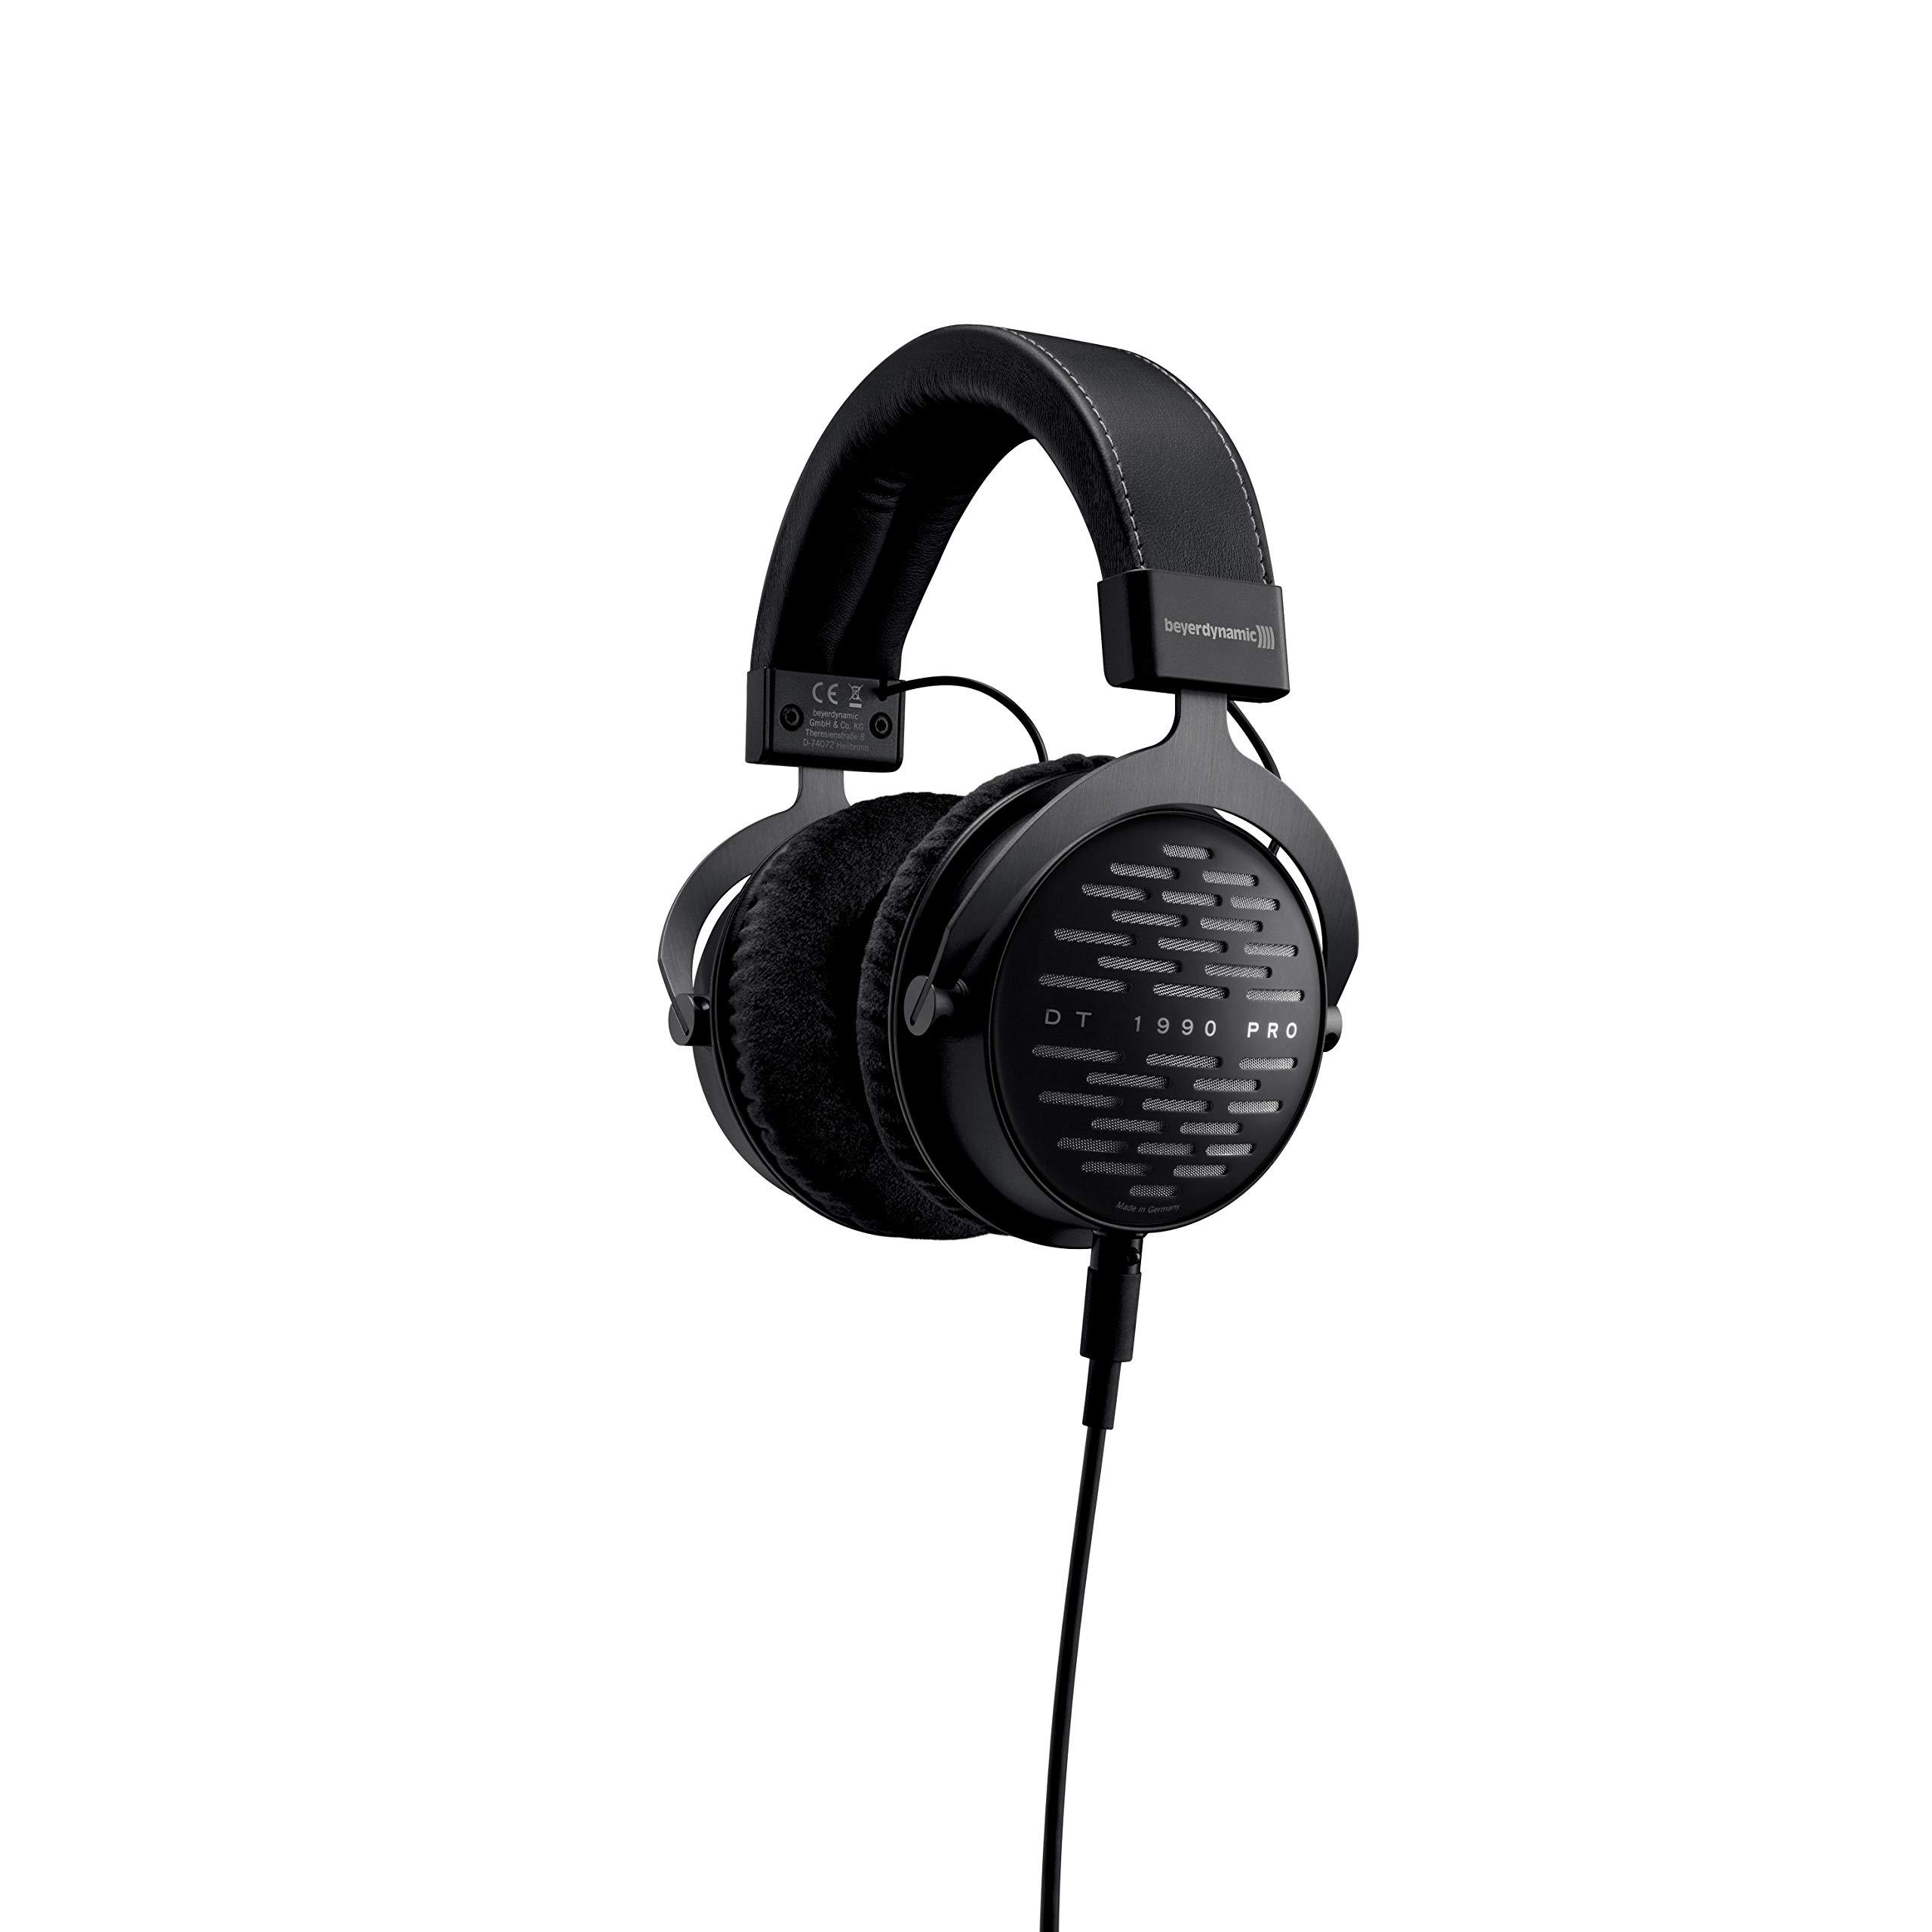 beyerdynamic DT 1990 Pro Open Studio Headphones by beyerdynamic